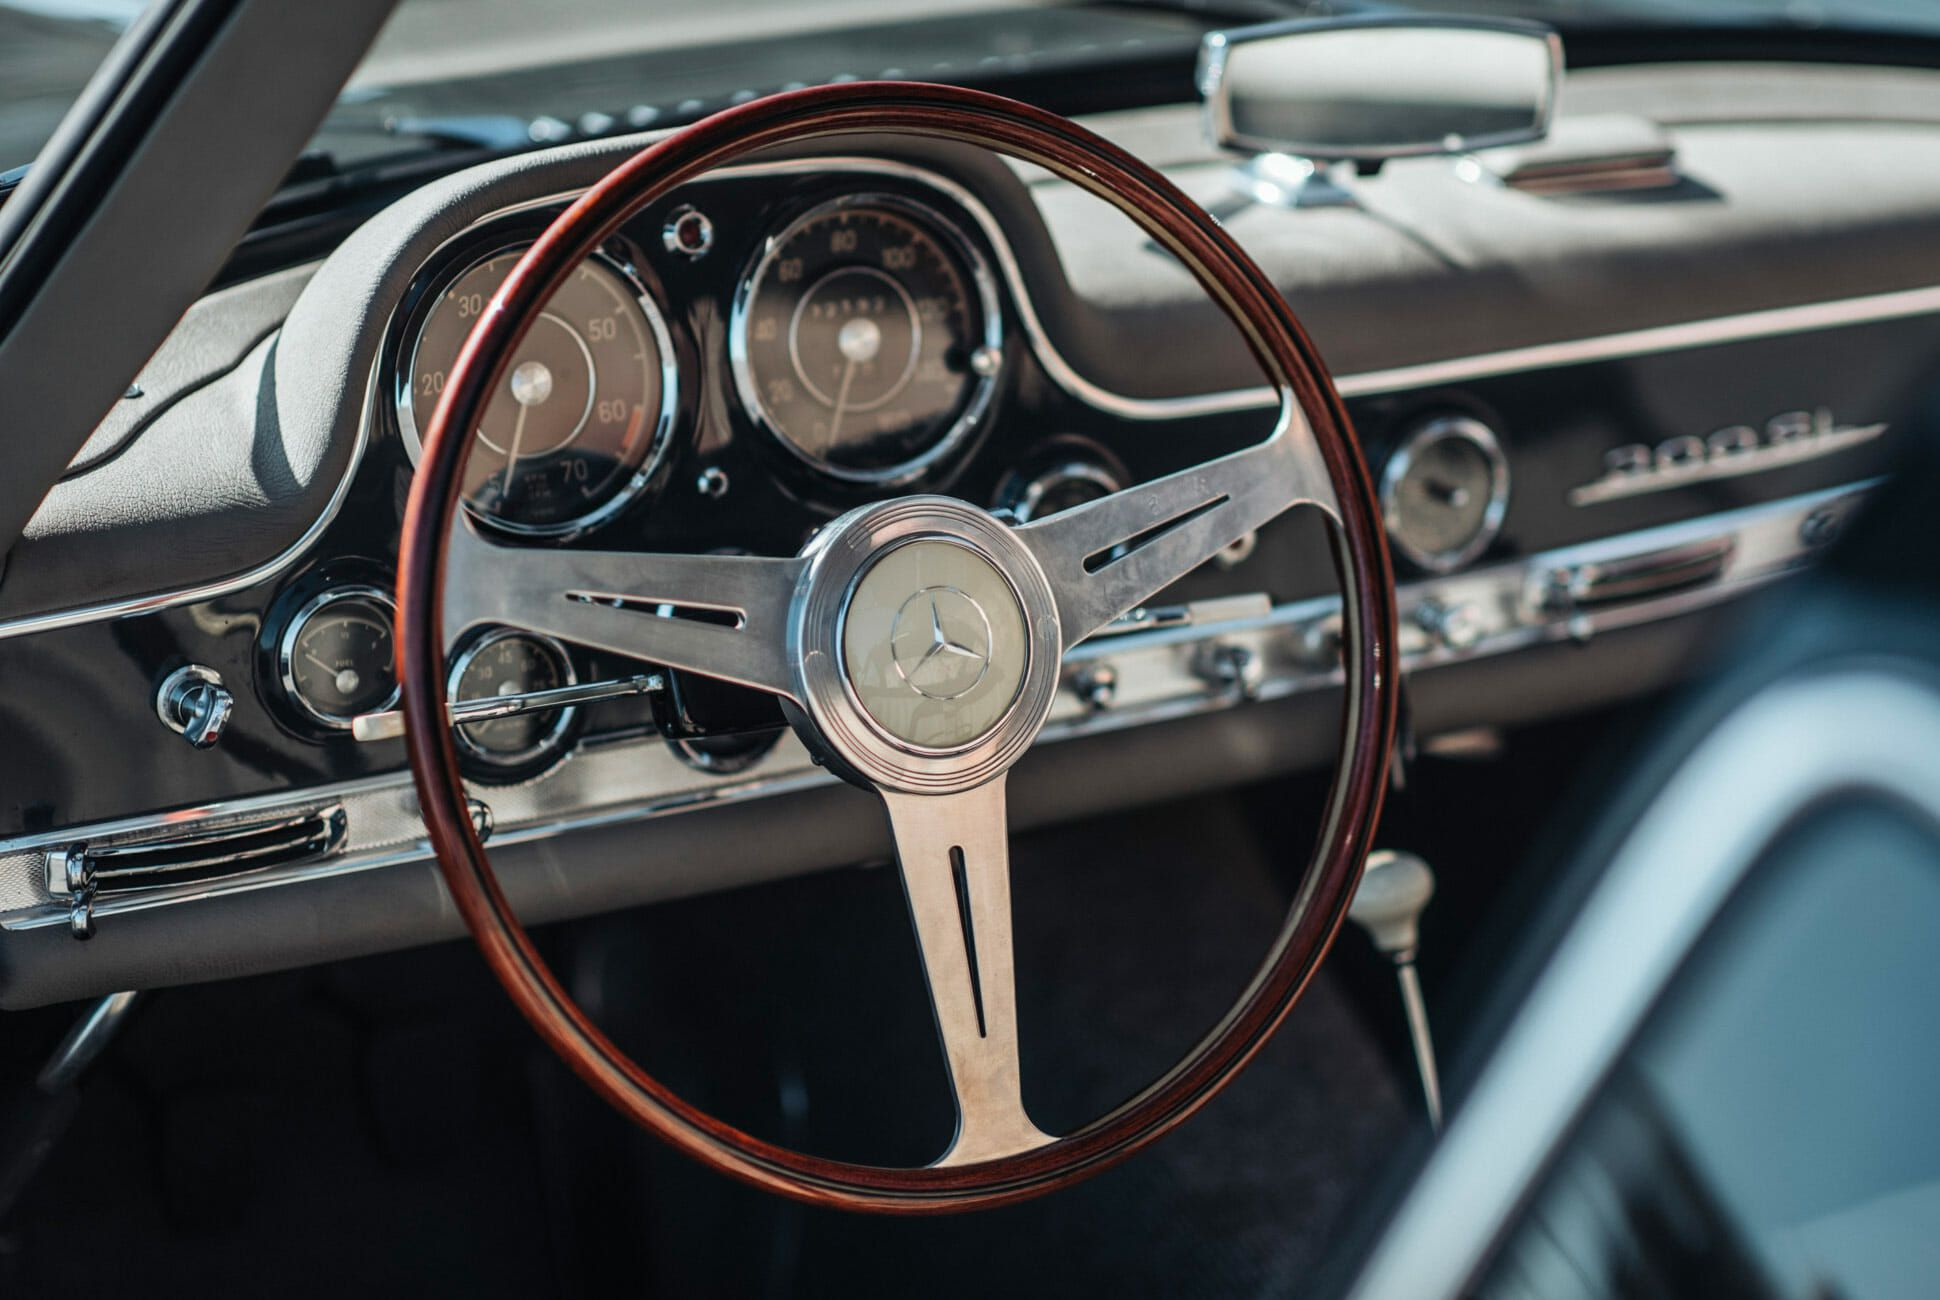 1956-Mercedes-Benz-300SL-Gullwing-gear-patrol-slide-11